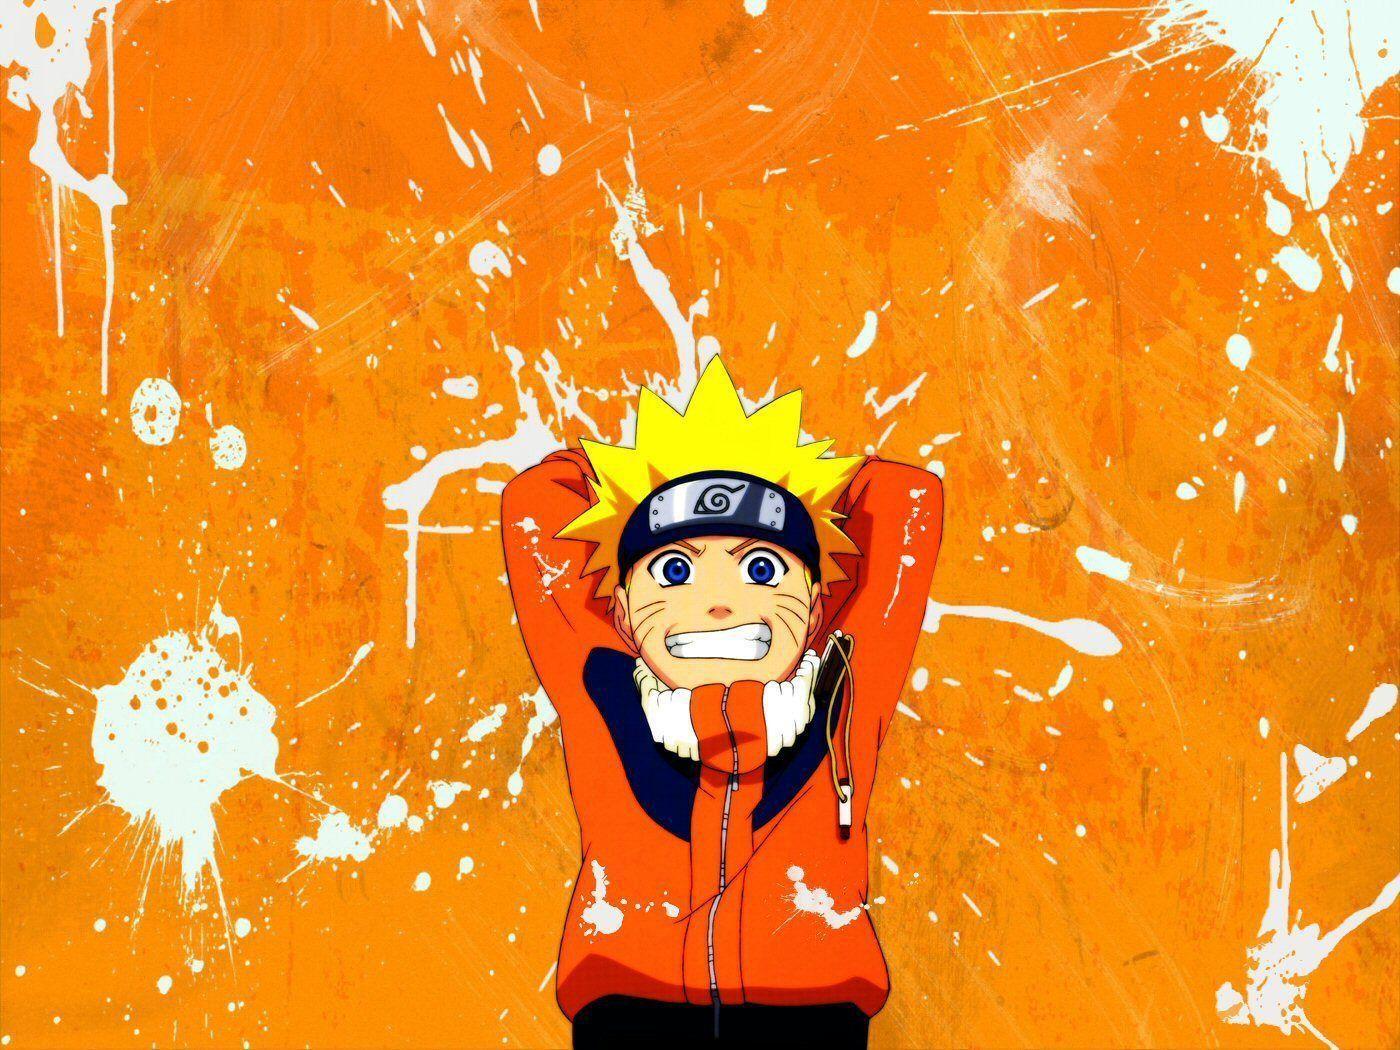 Orange Naruto Wallpapers Top Free Orange Naruto Backgrounds Wallpaperaccess